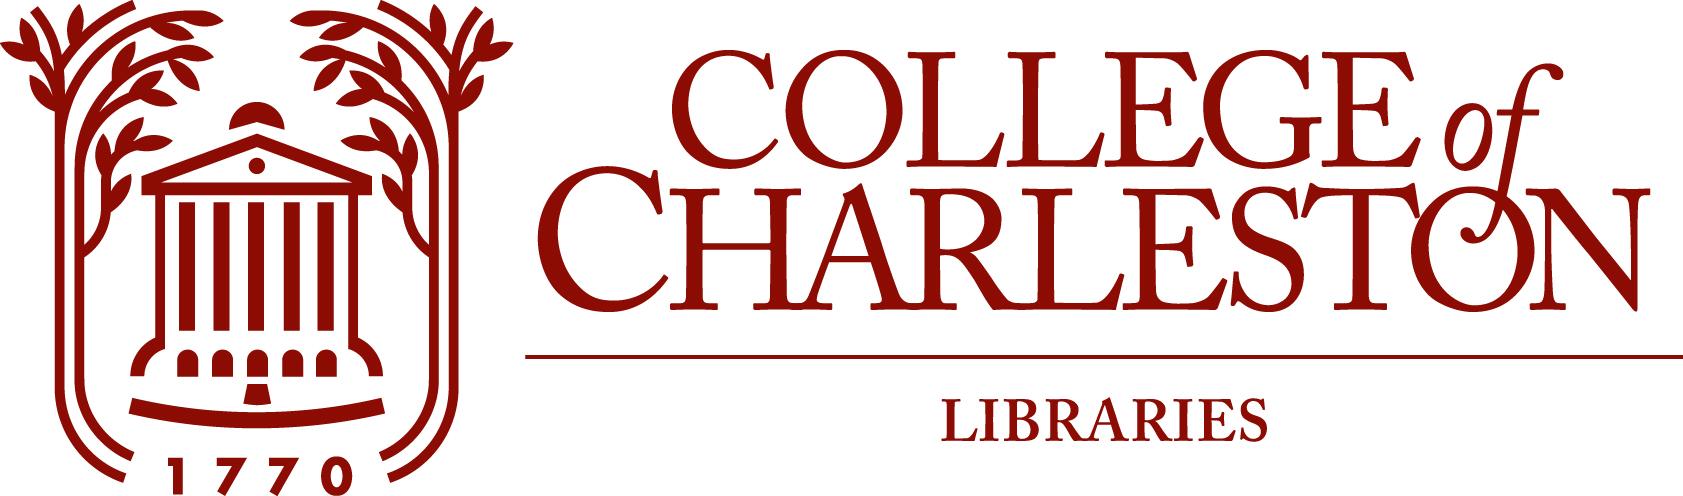 College of Charleston Libraries logo